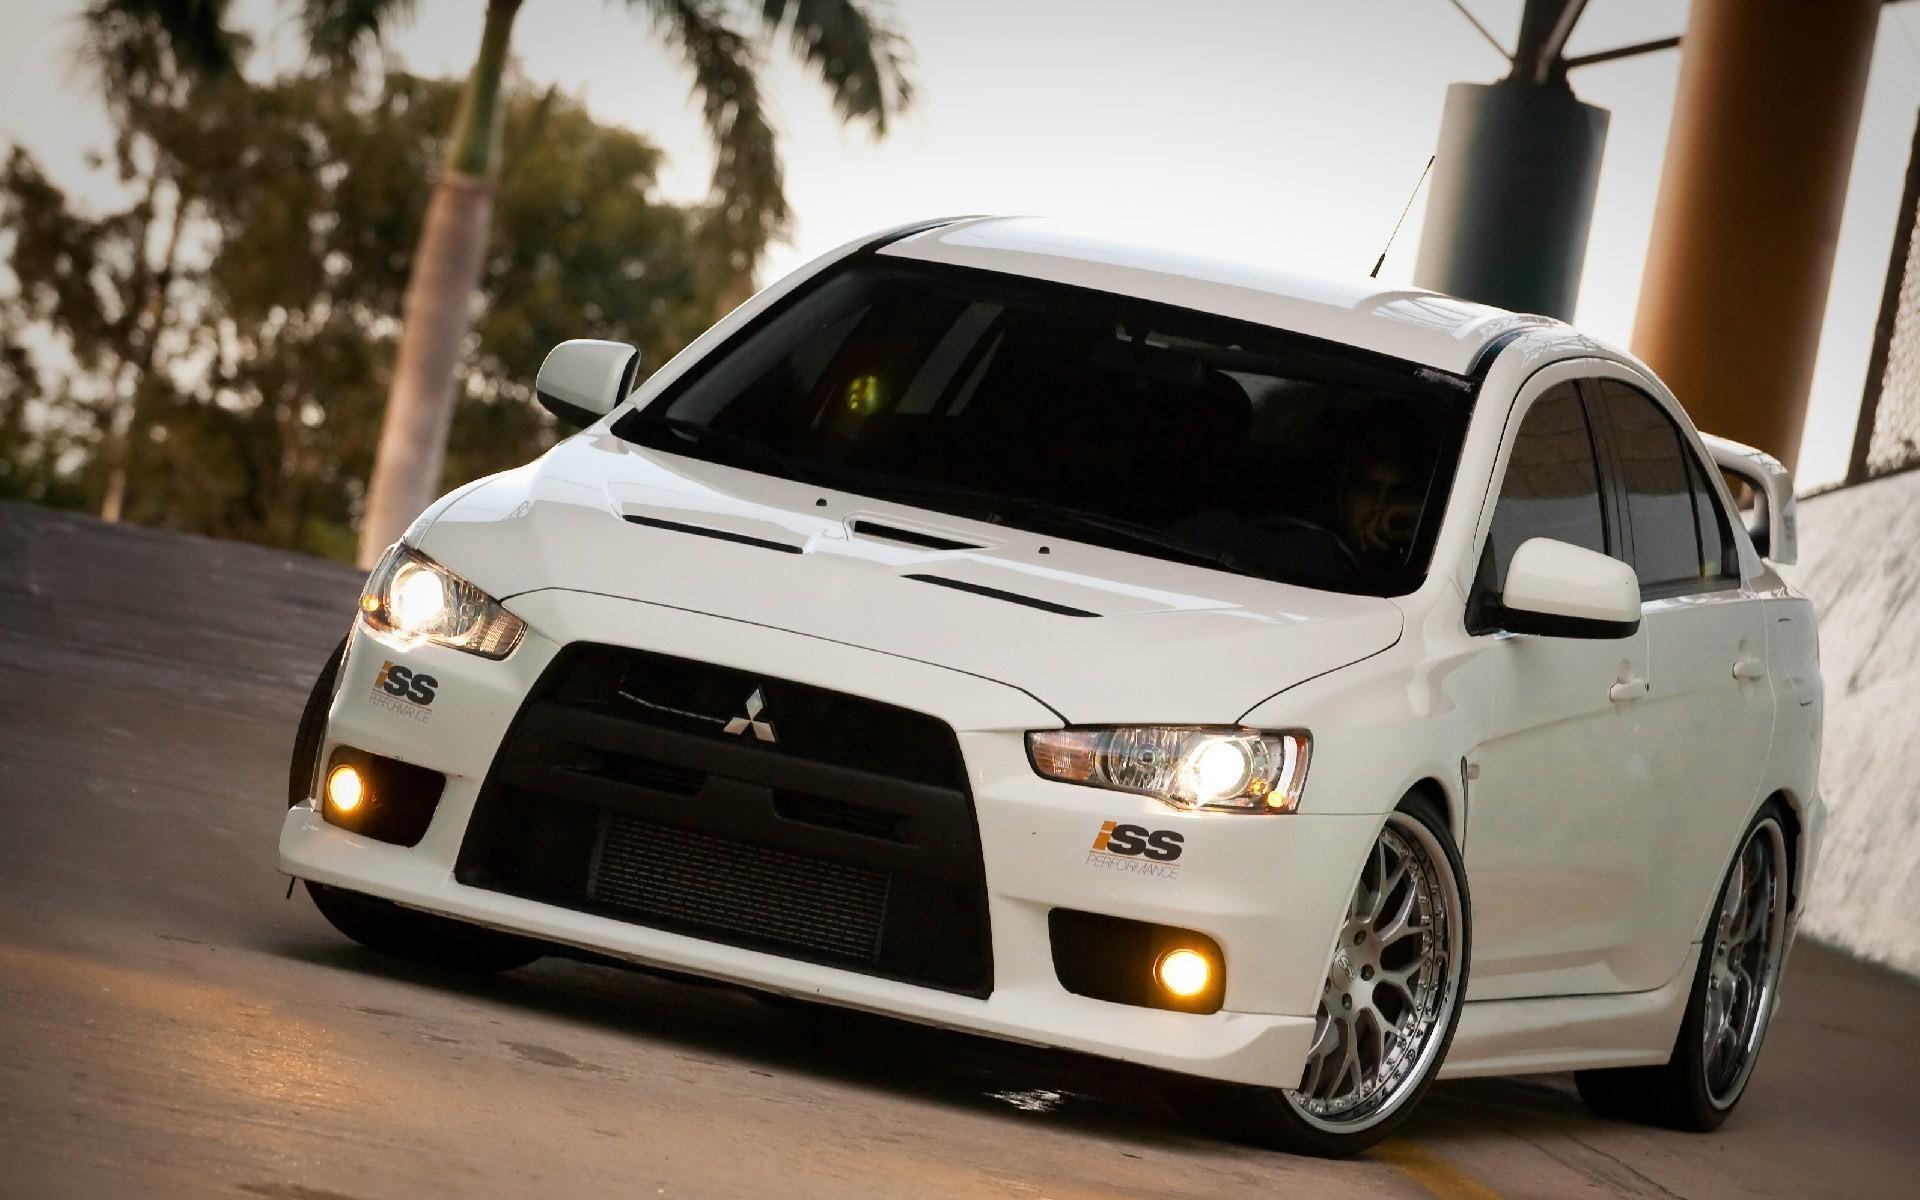 Mitsubishi Lancer Evo Wallpaper Wallpapertag